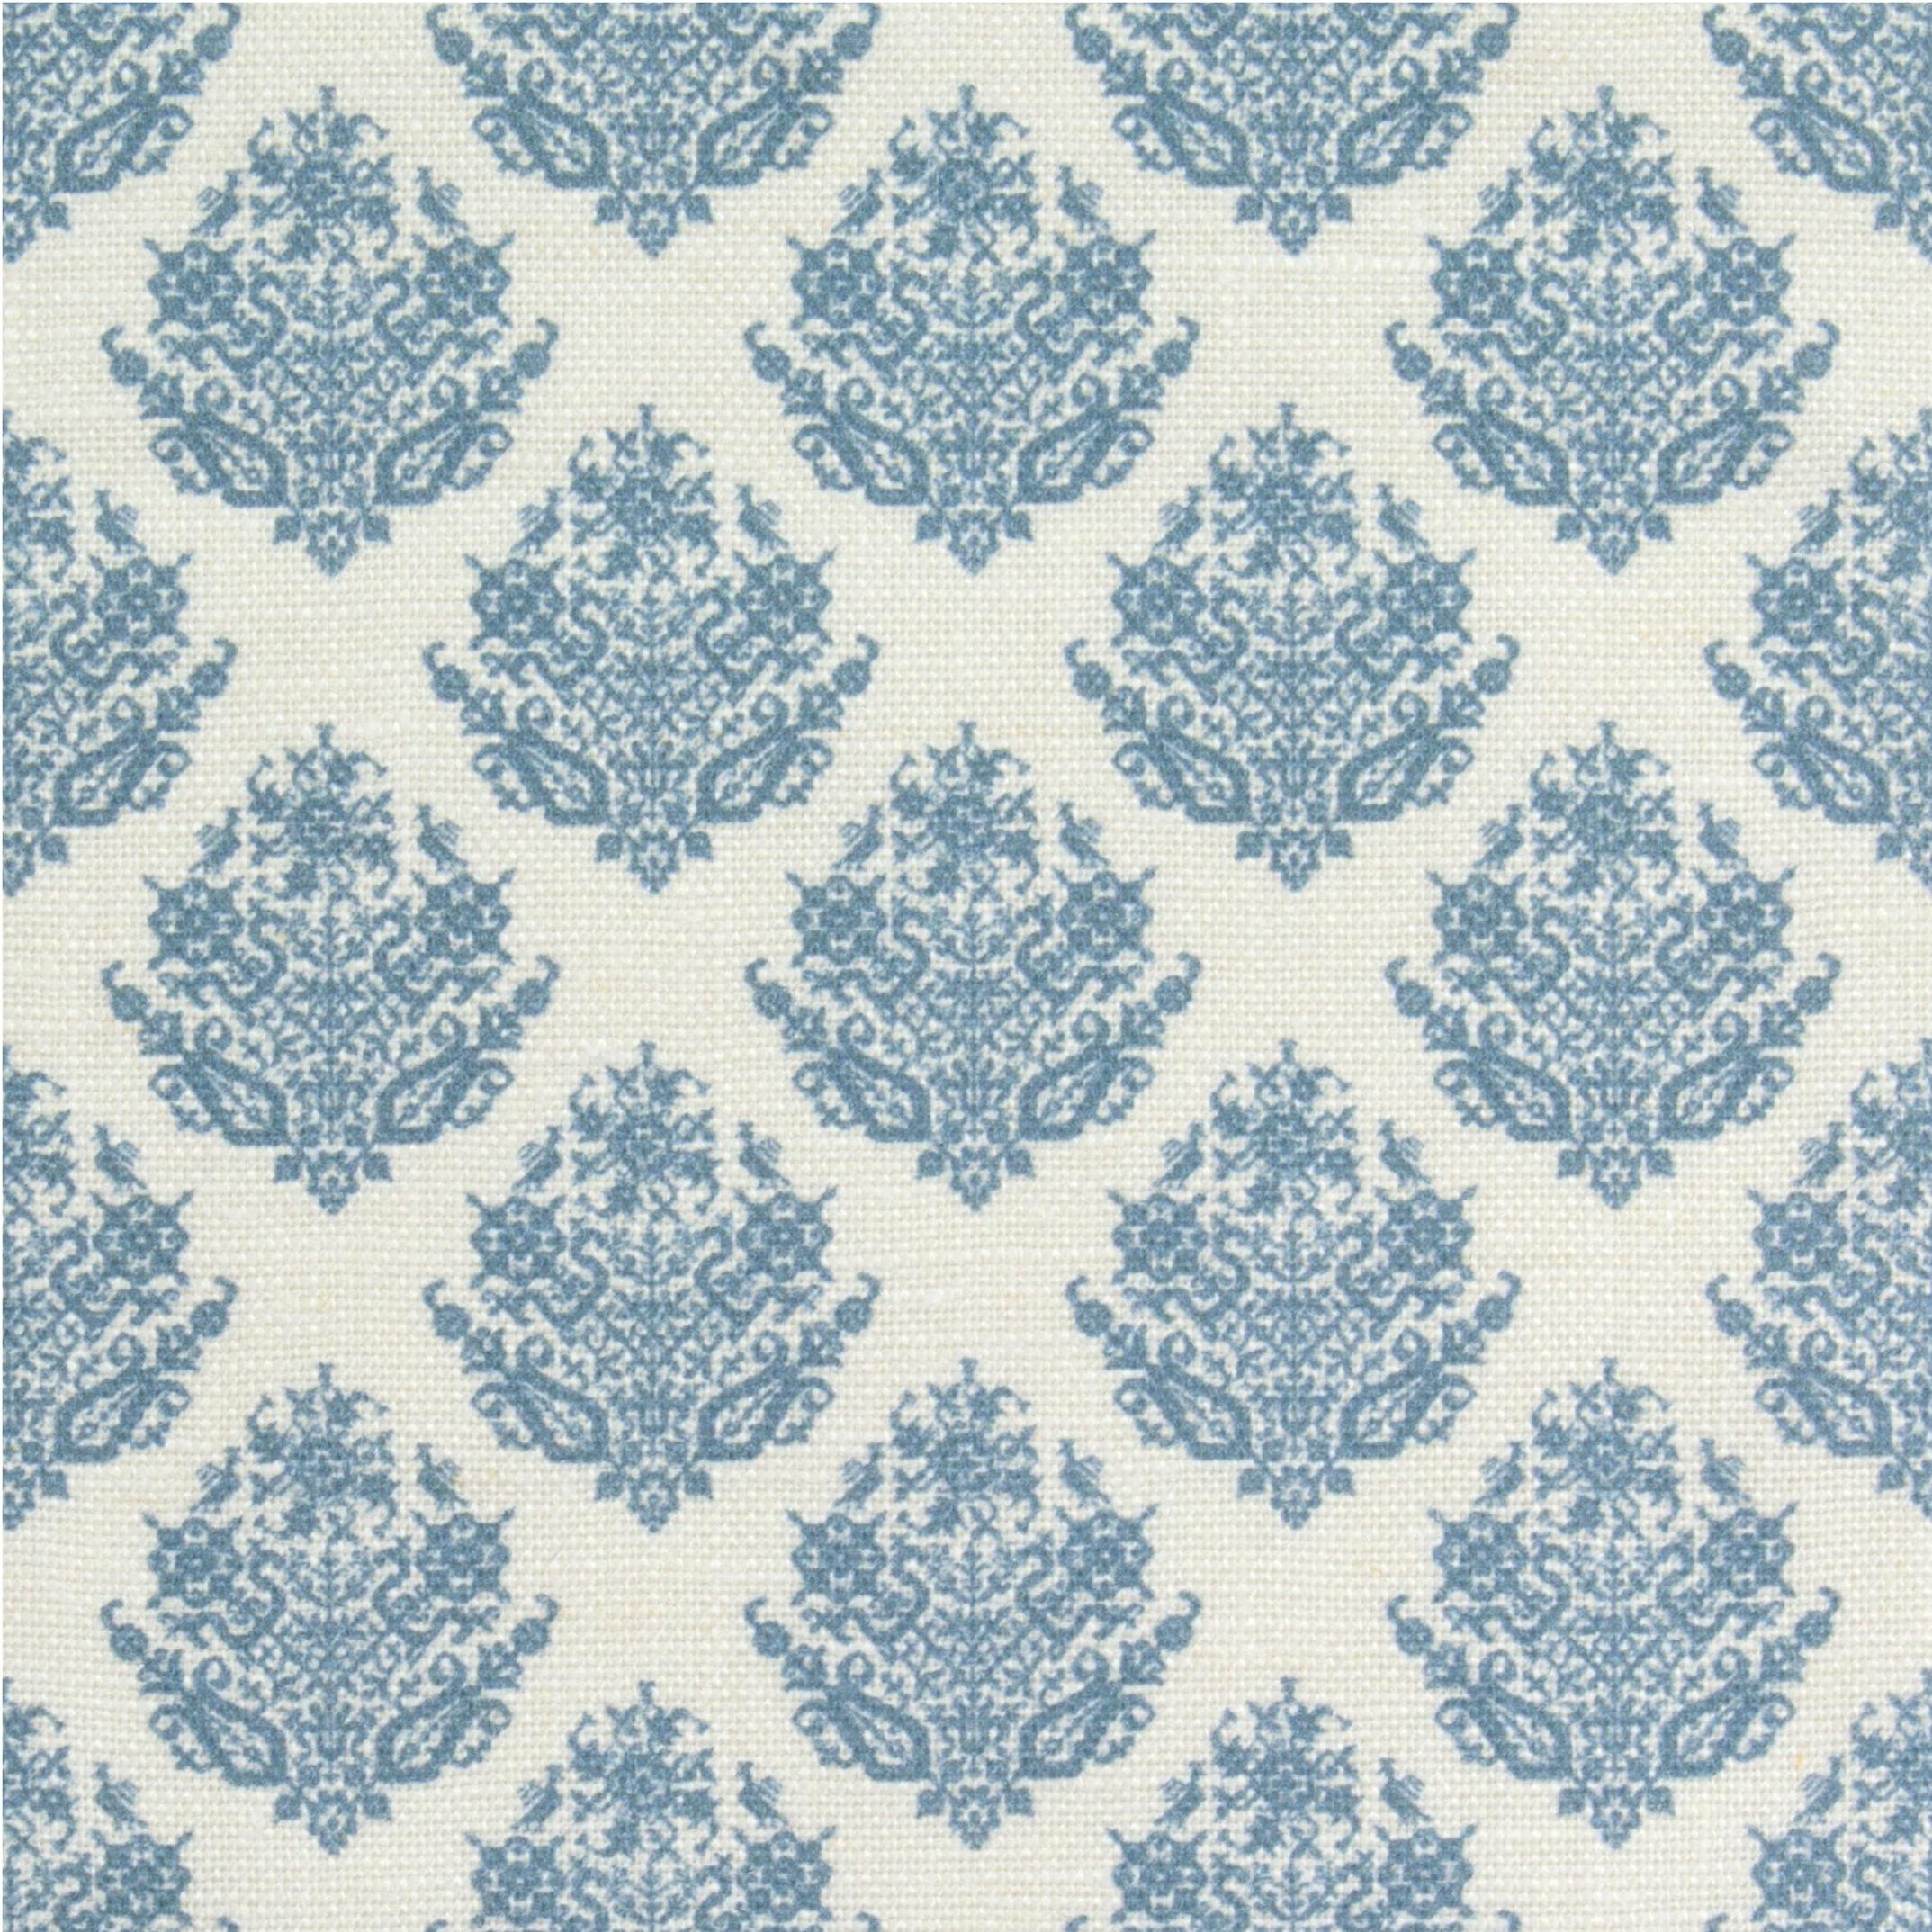 Textile_blue_ivory.jpg